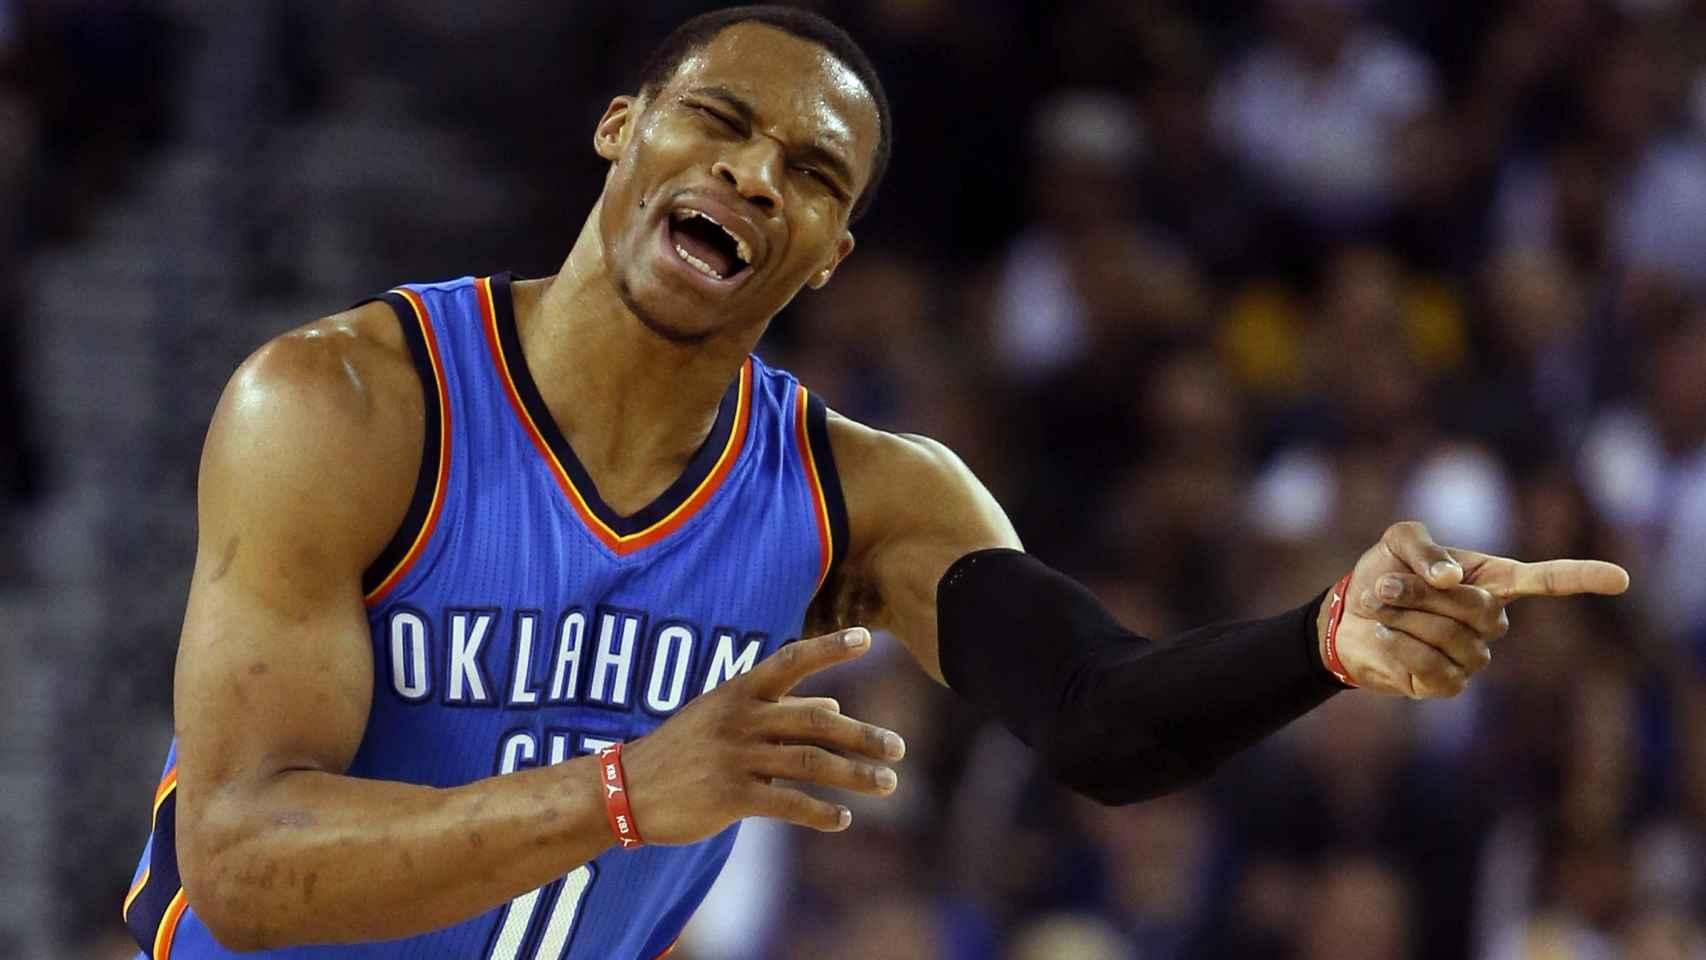 Russell Westbrook reacciona tras una falta contra los Golden State Warriors.